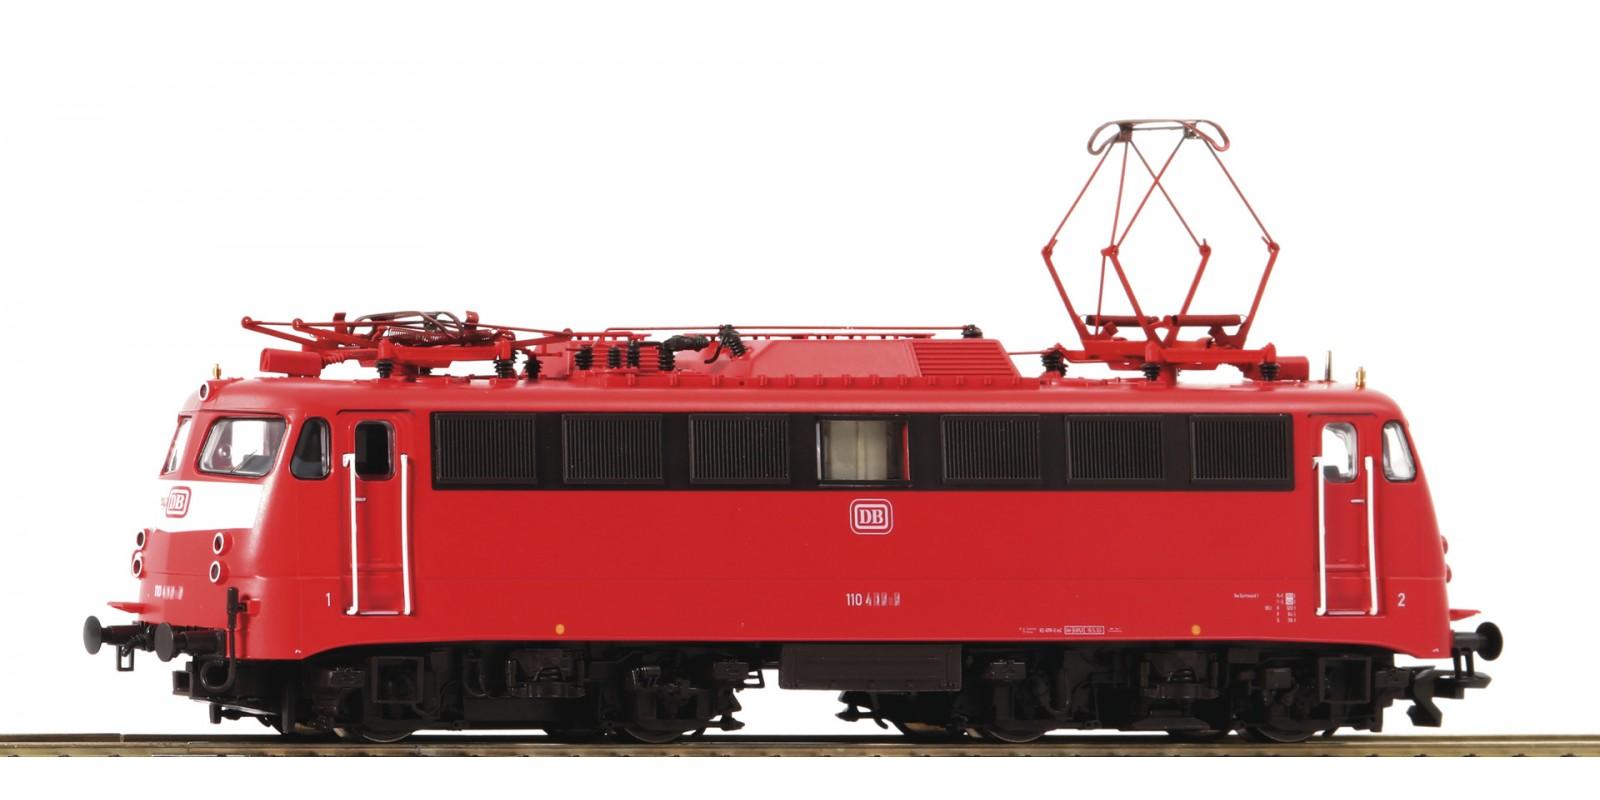 RO73072 - Electric locomotive 110 314-2, DB